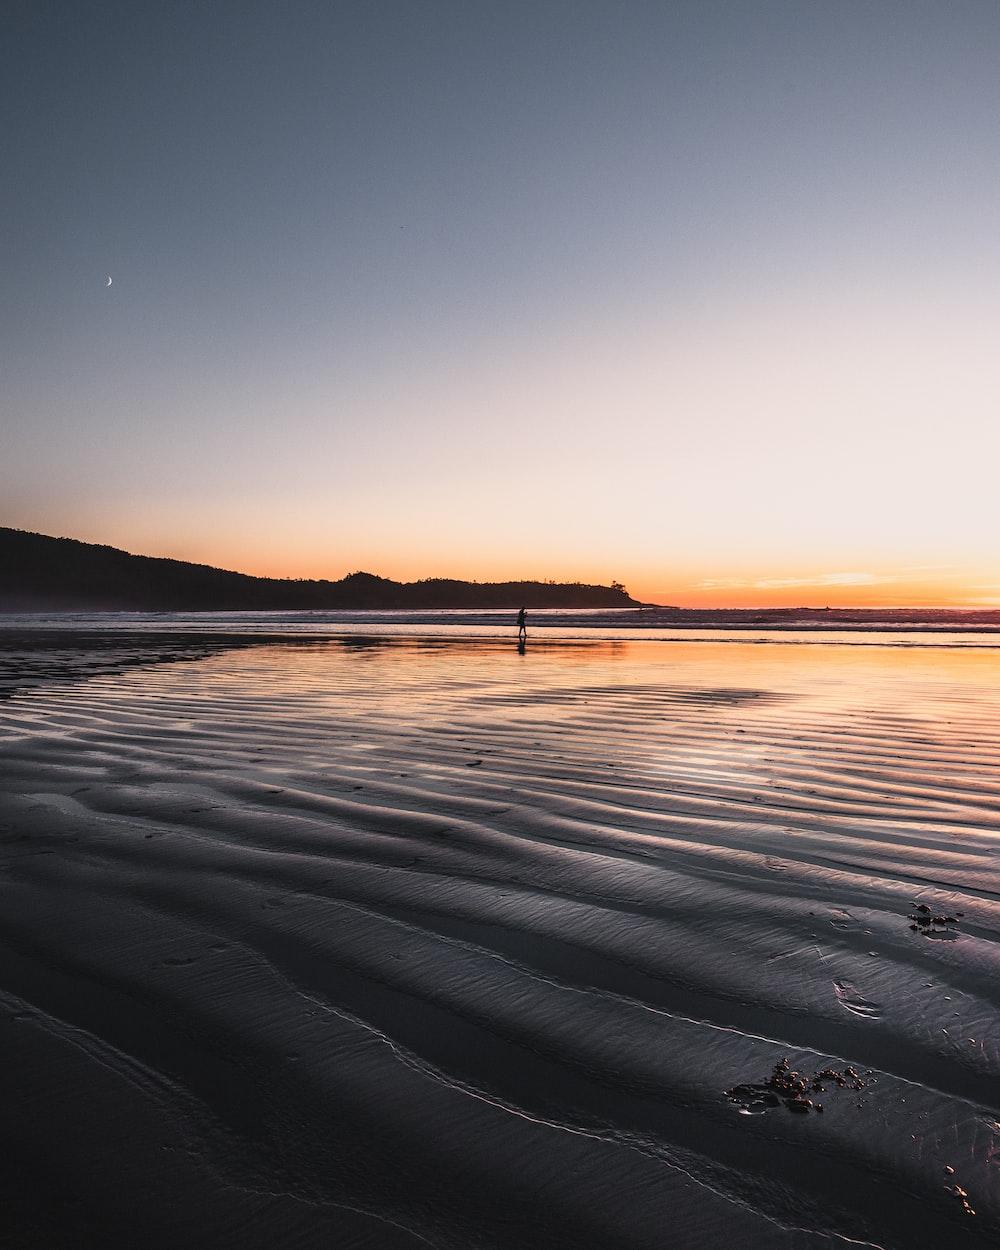 calm ocean during golden hour